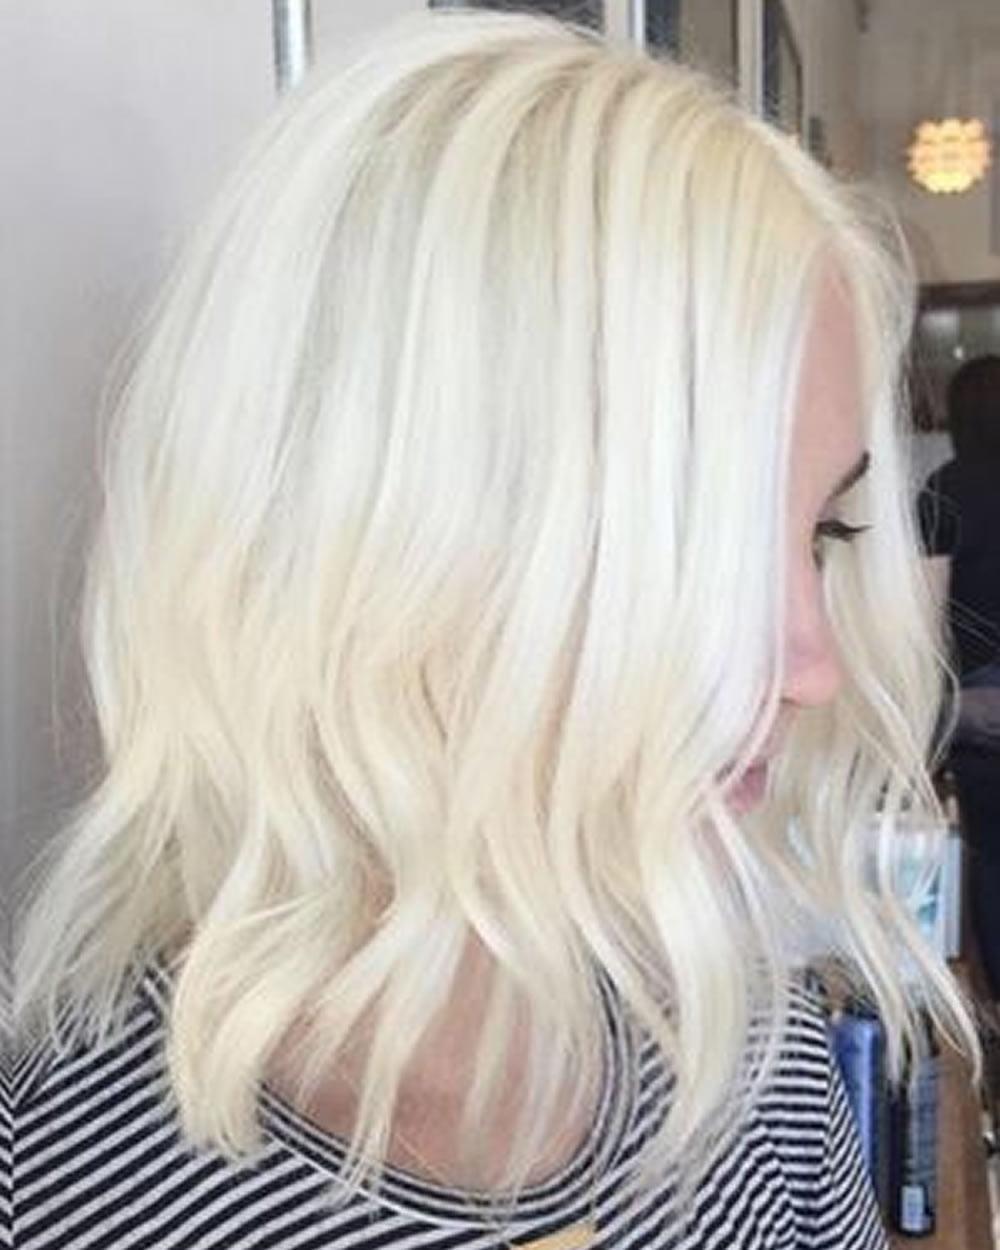 2018 Short Layered Bob Hairstyles & Short Haircuts for Modern Women - Short Hair Colors